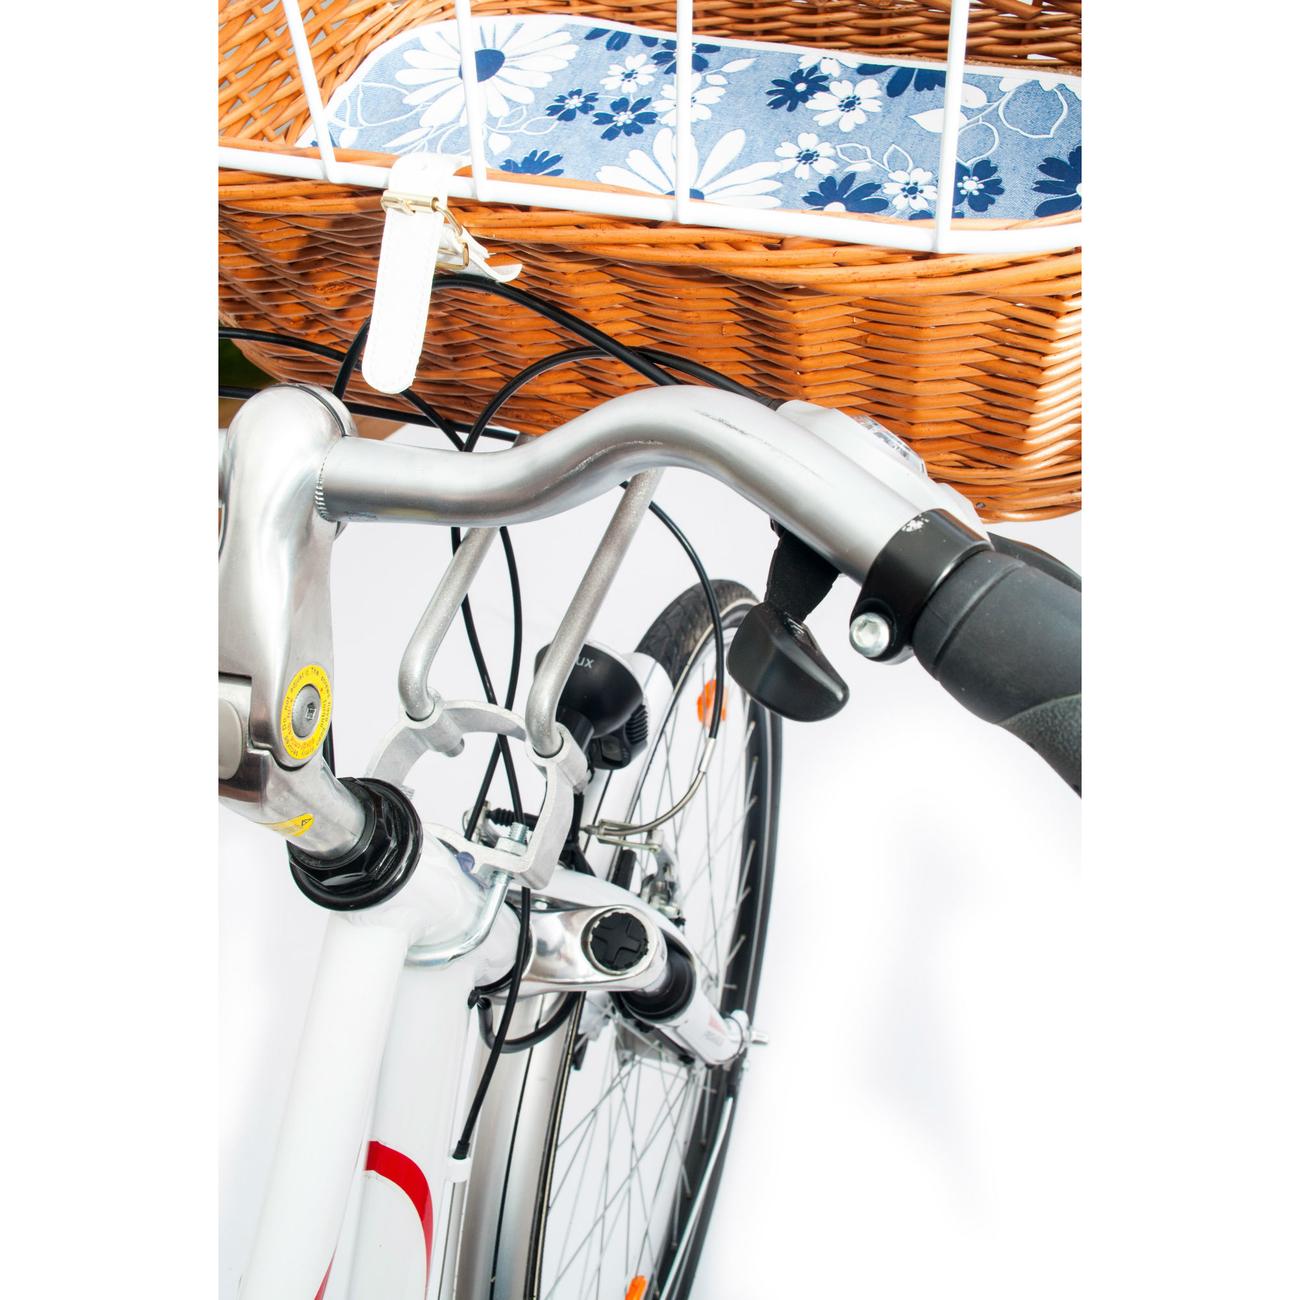 Aumüller E-Bike Hunde Fahrradkorb Standard vorne, Bild 14